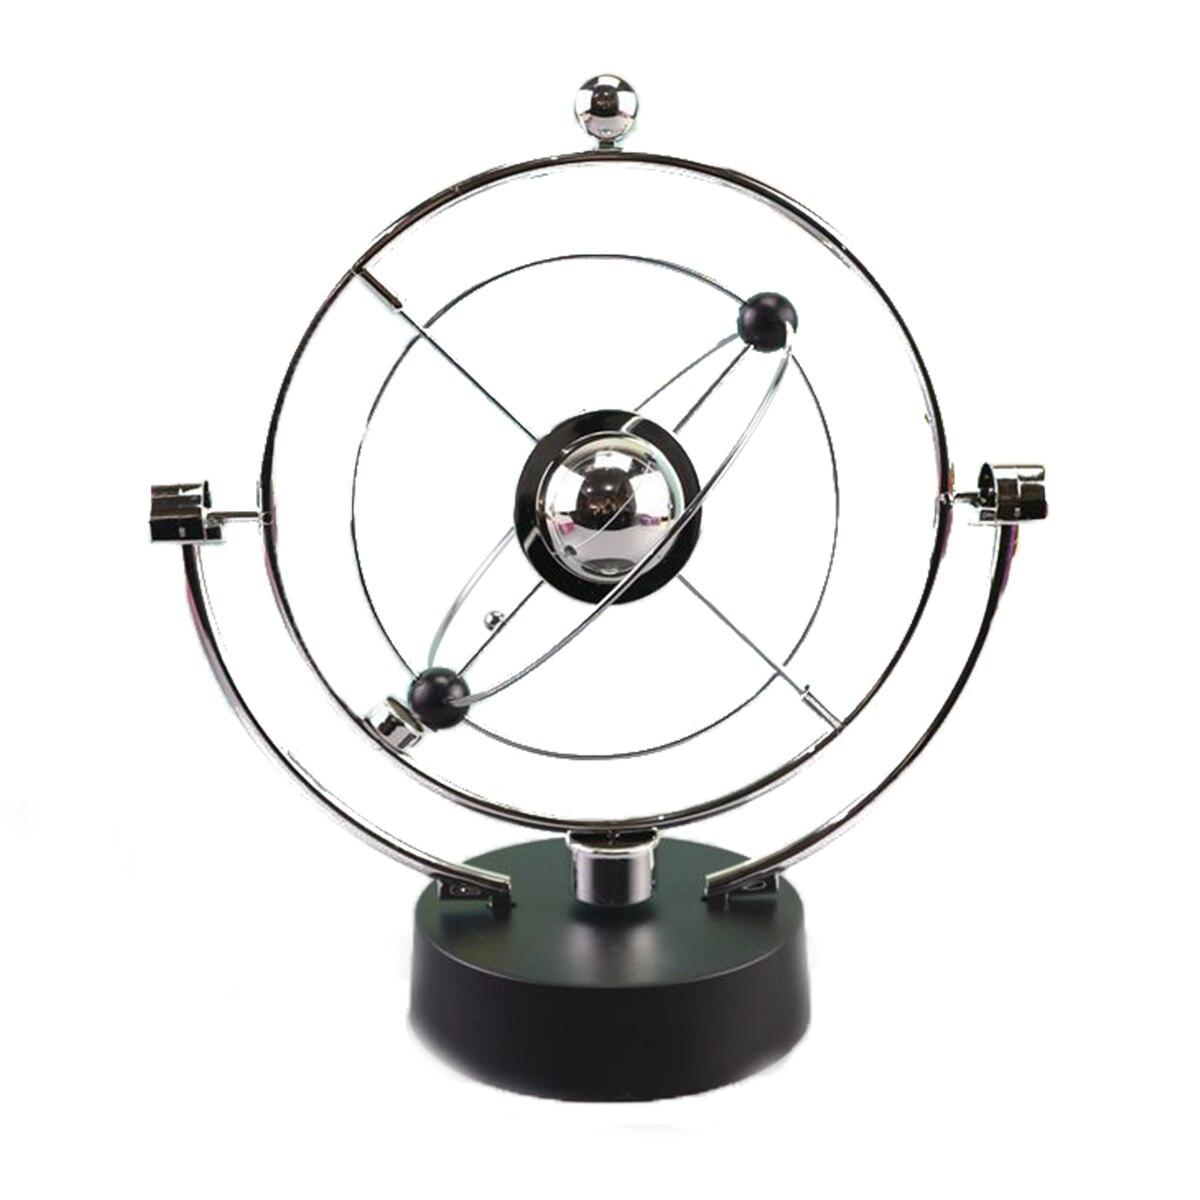 >Rotation Perpetual Motion Swing Celestial Globe Newton Pendulum Model Kinetic Orbital Revolving Gadget <font><b>Home</b></font> <font><b>Decor</b></font> Craft <font><b>Ornament</b></font>